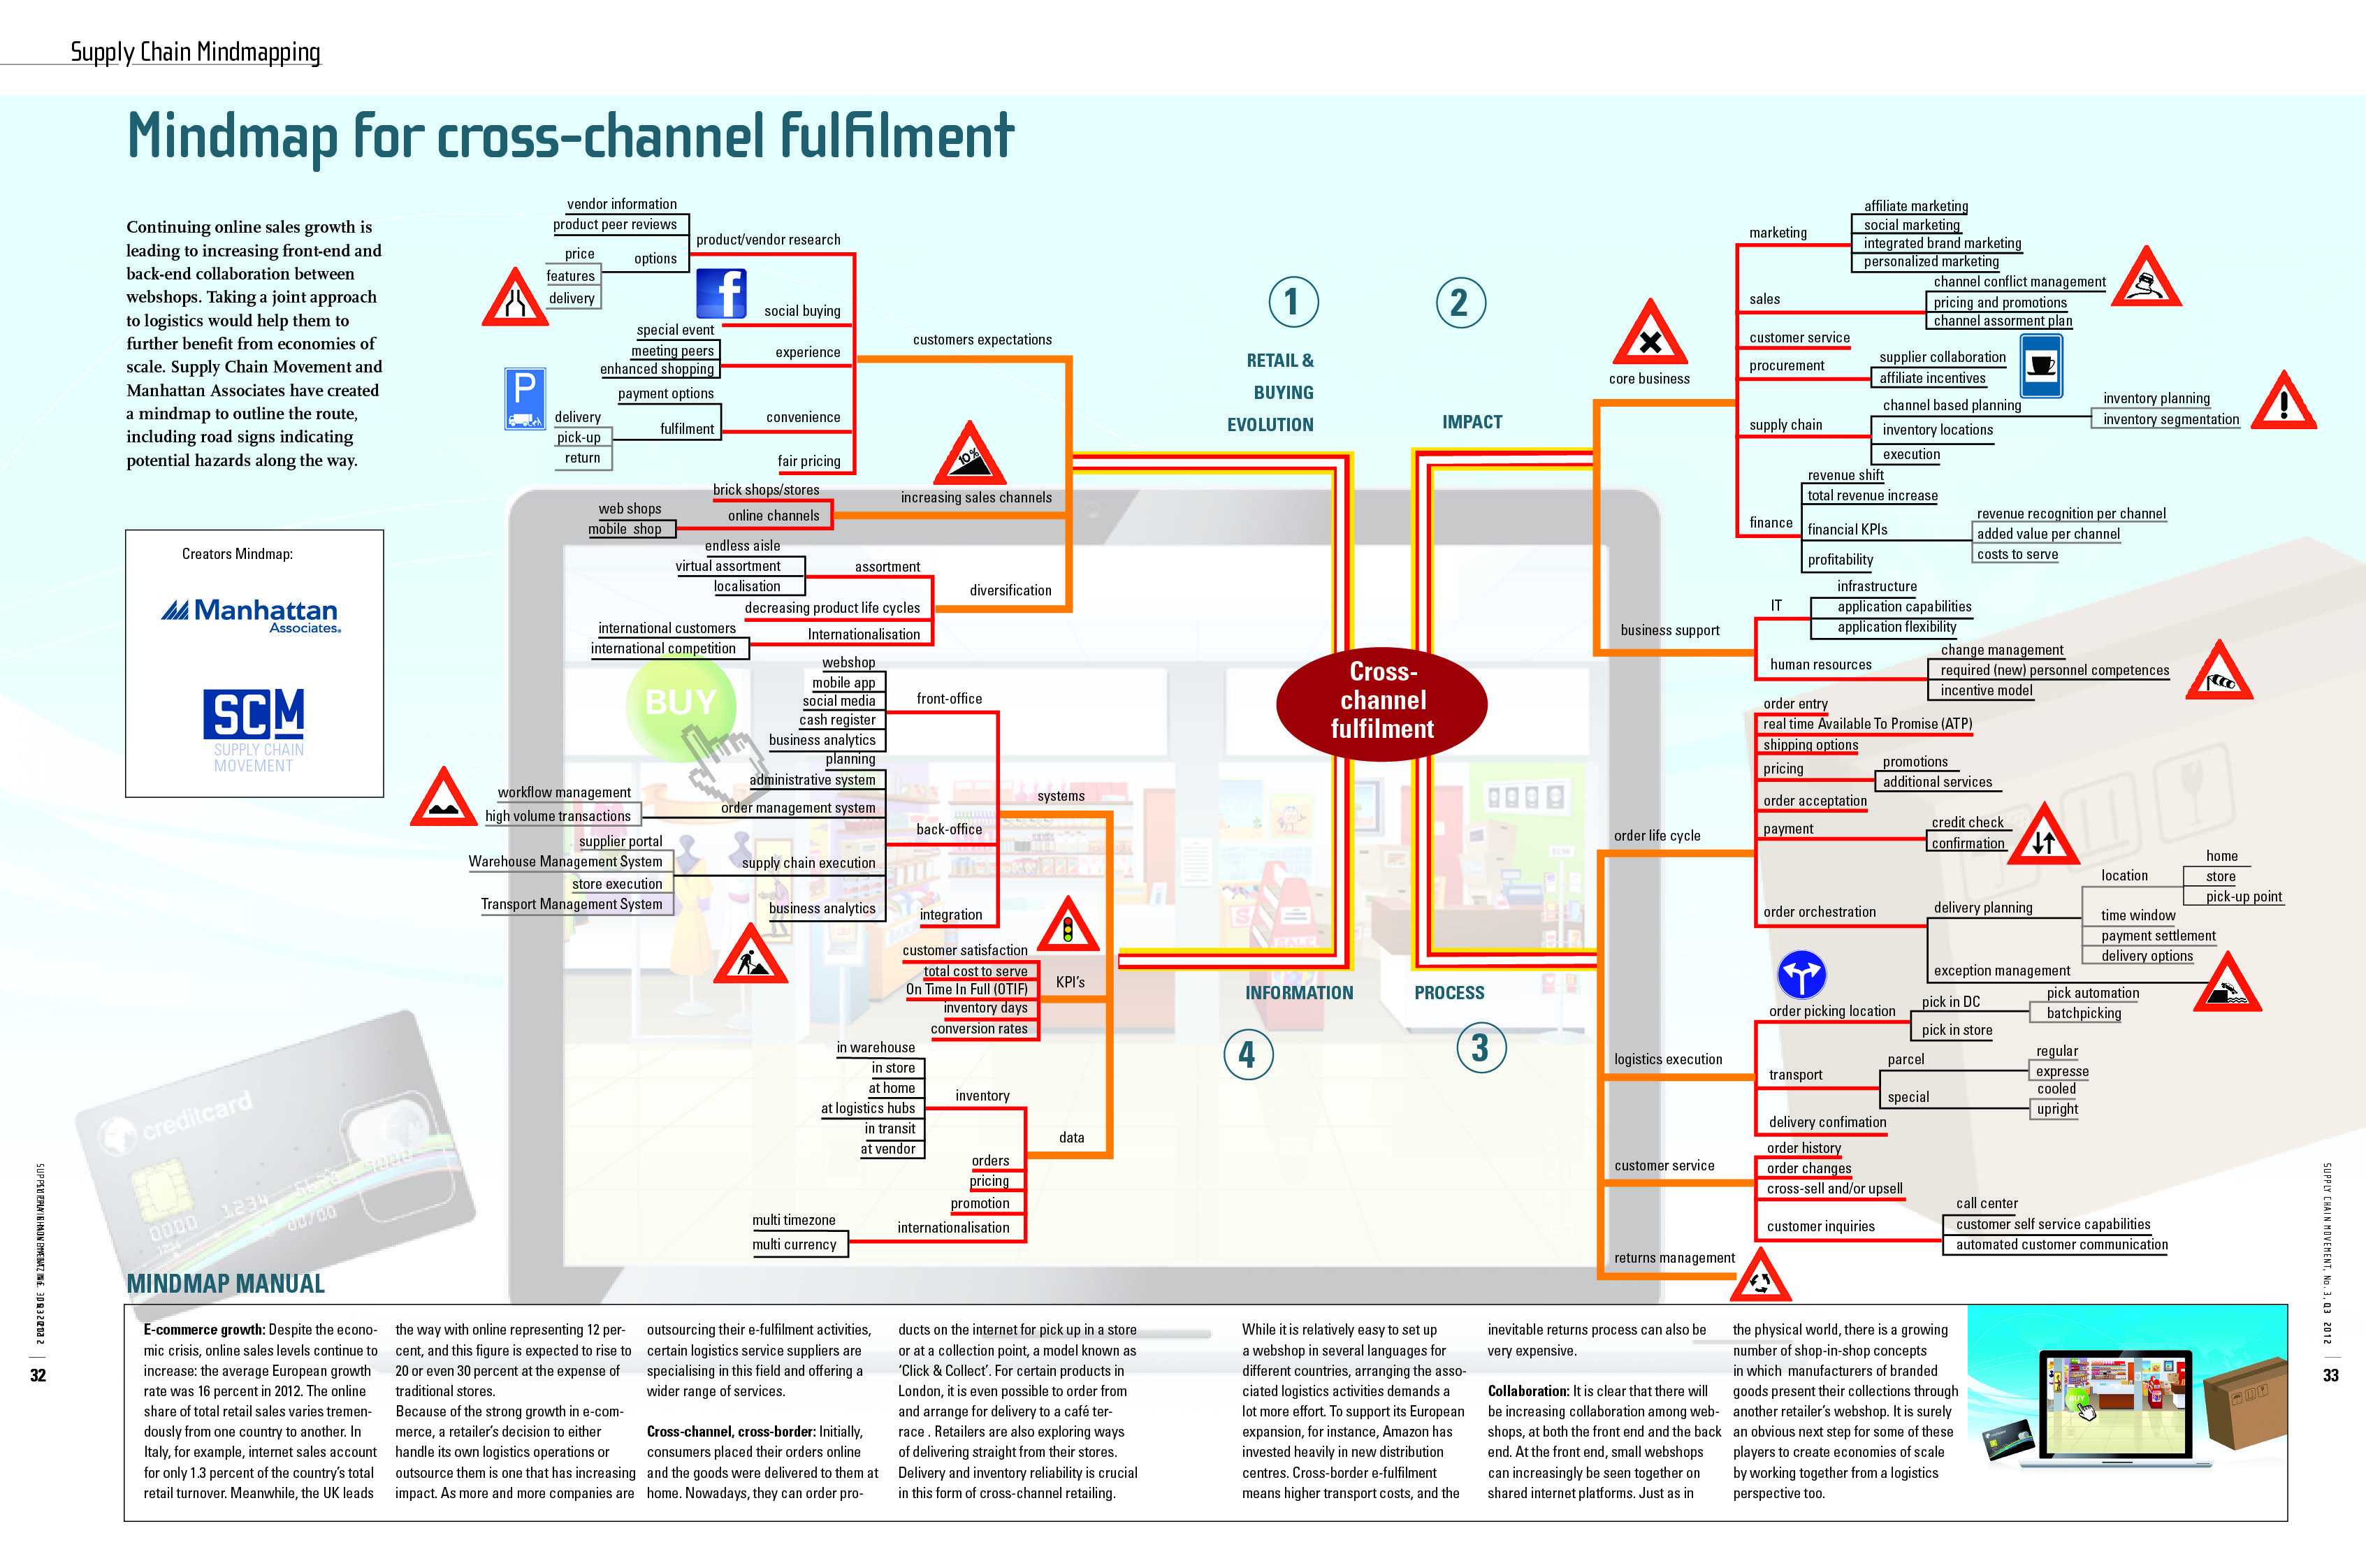 Mindmap for Cross-Channel Fulfilment (2012) #supplychain #ecommerce #elogistics